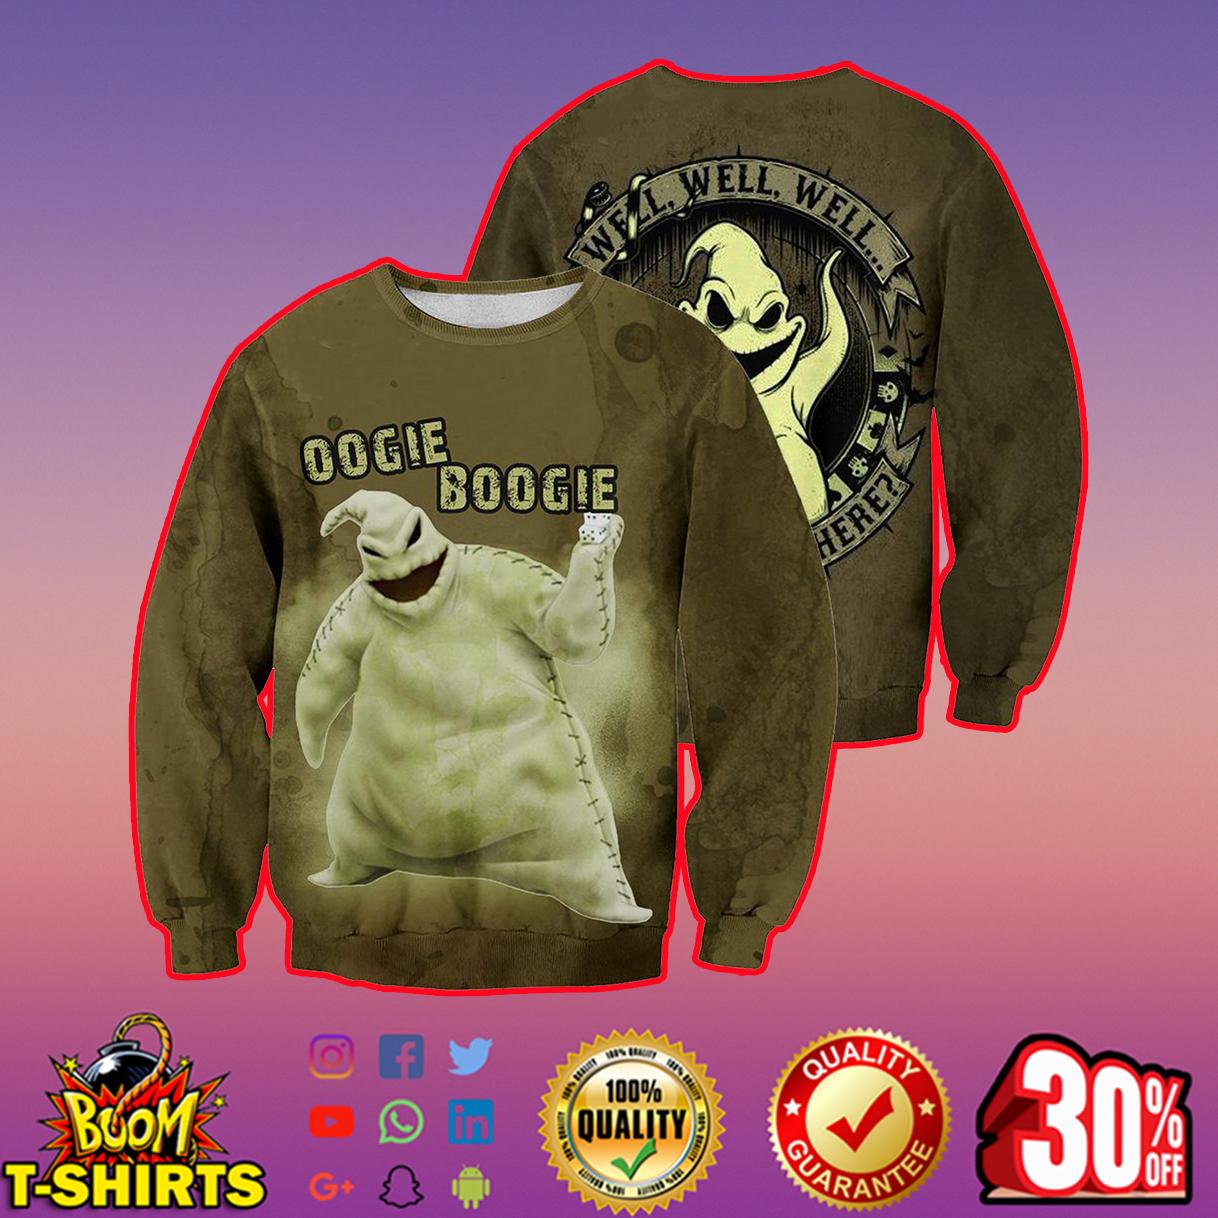 Oogie Boogie 3d shirt, 3d hoodie - sweatshirt 3d